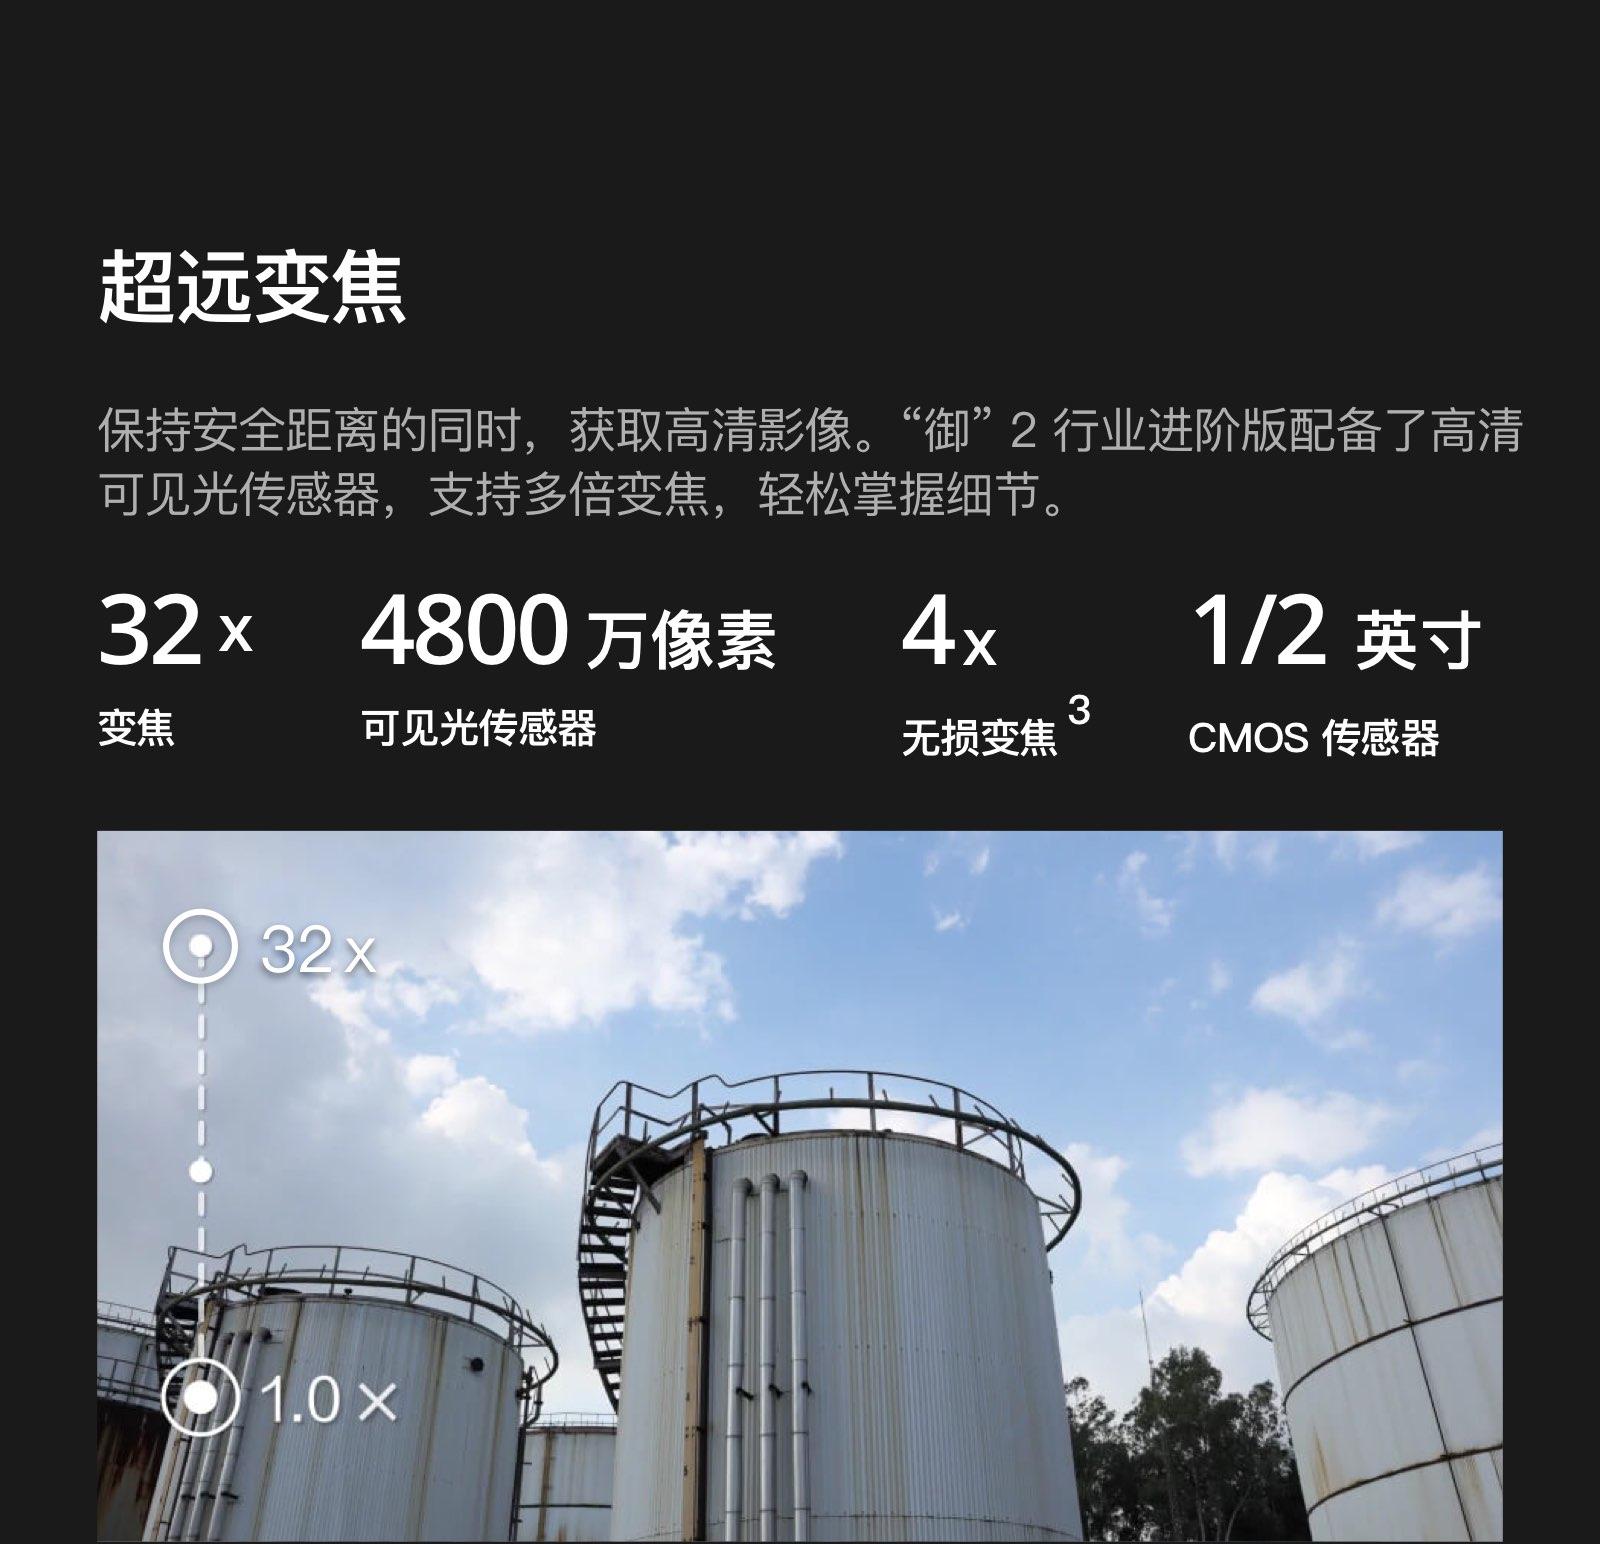 M2EA_PC%20_cn_5.jpg